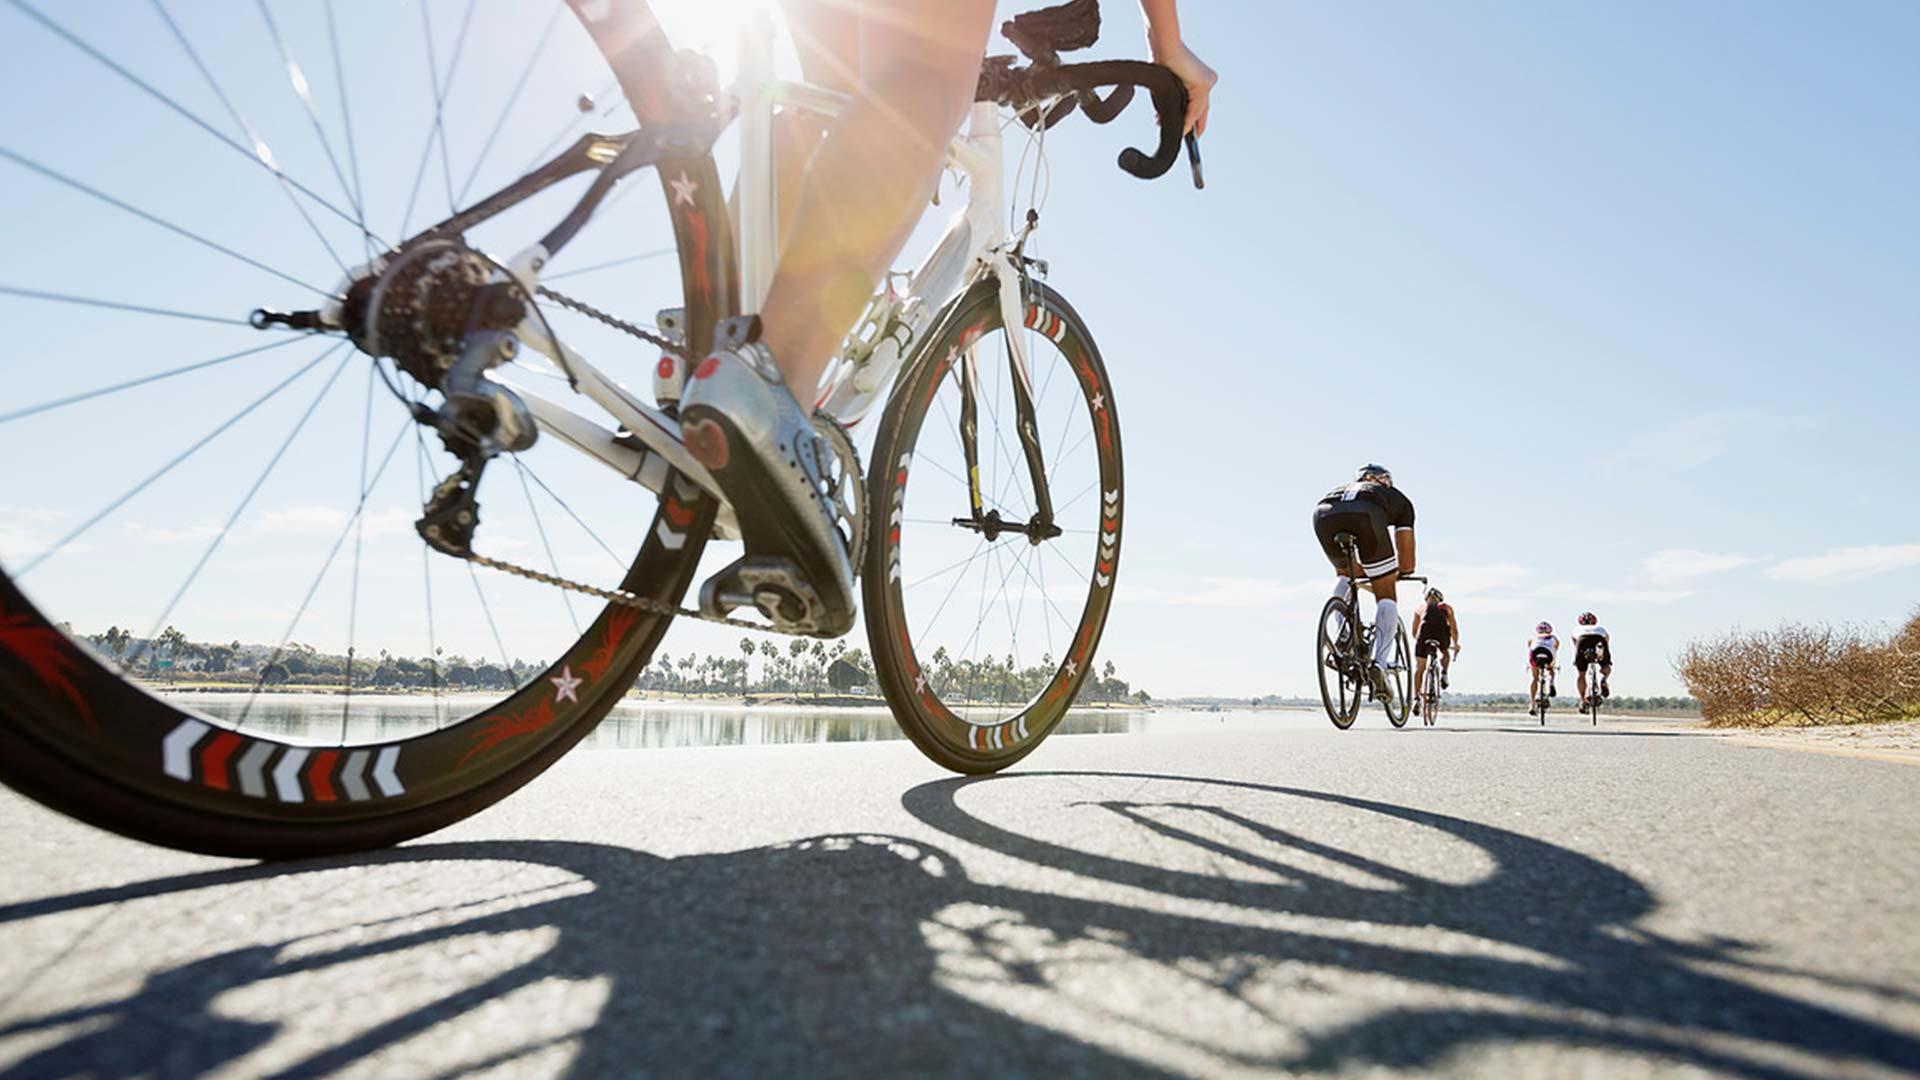 cobbles wielrennen racefiets kopen